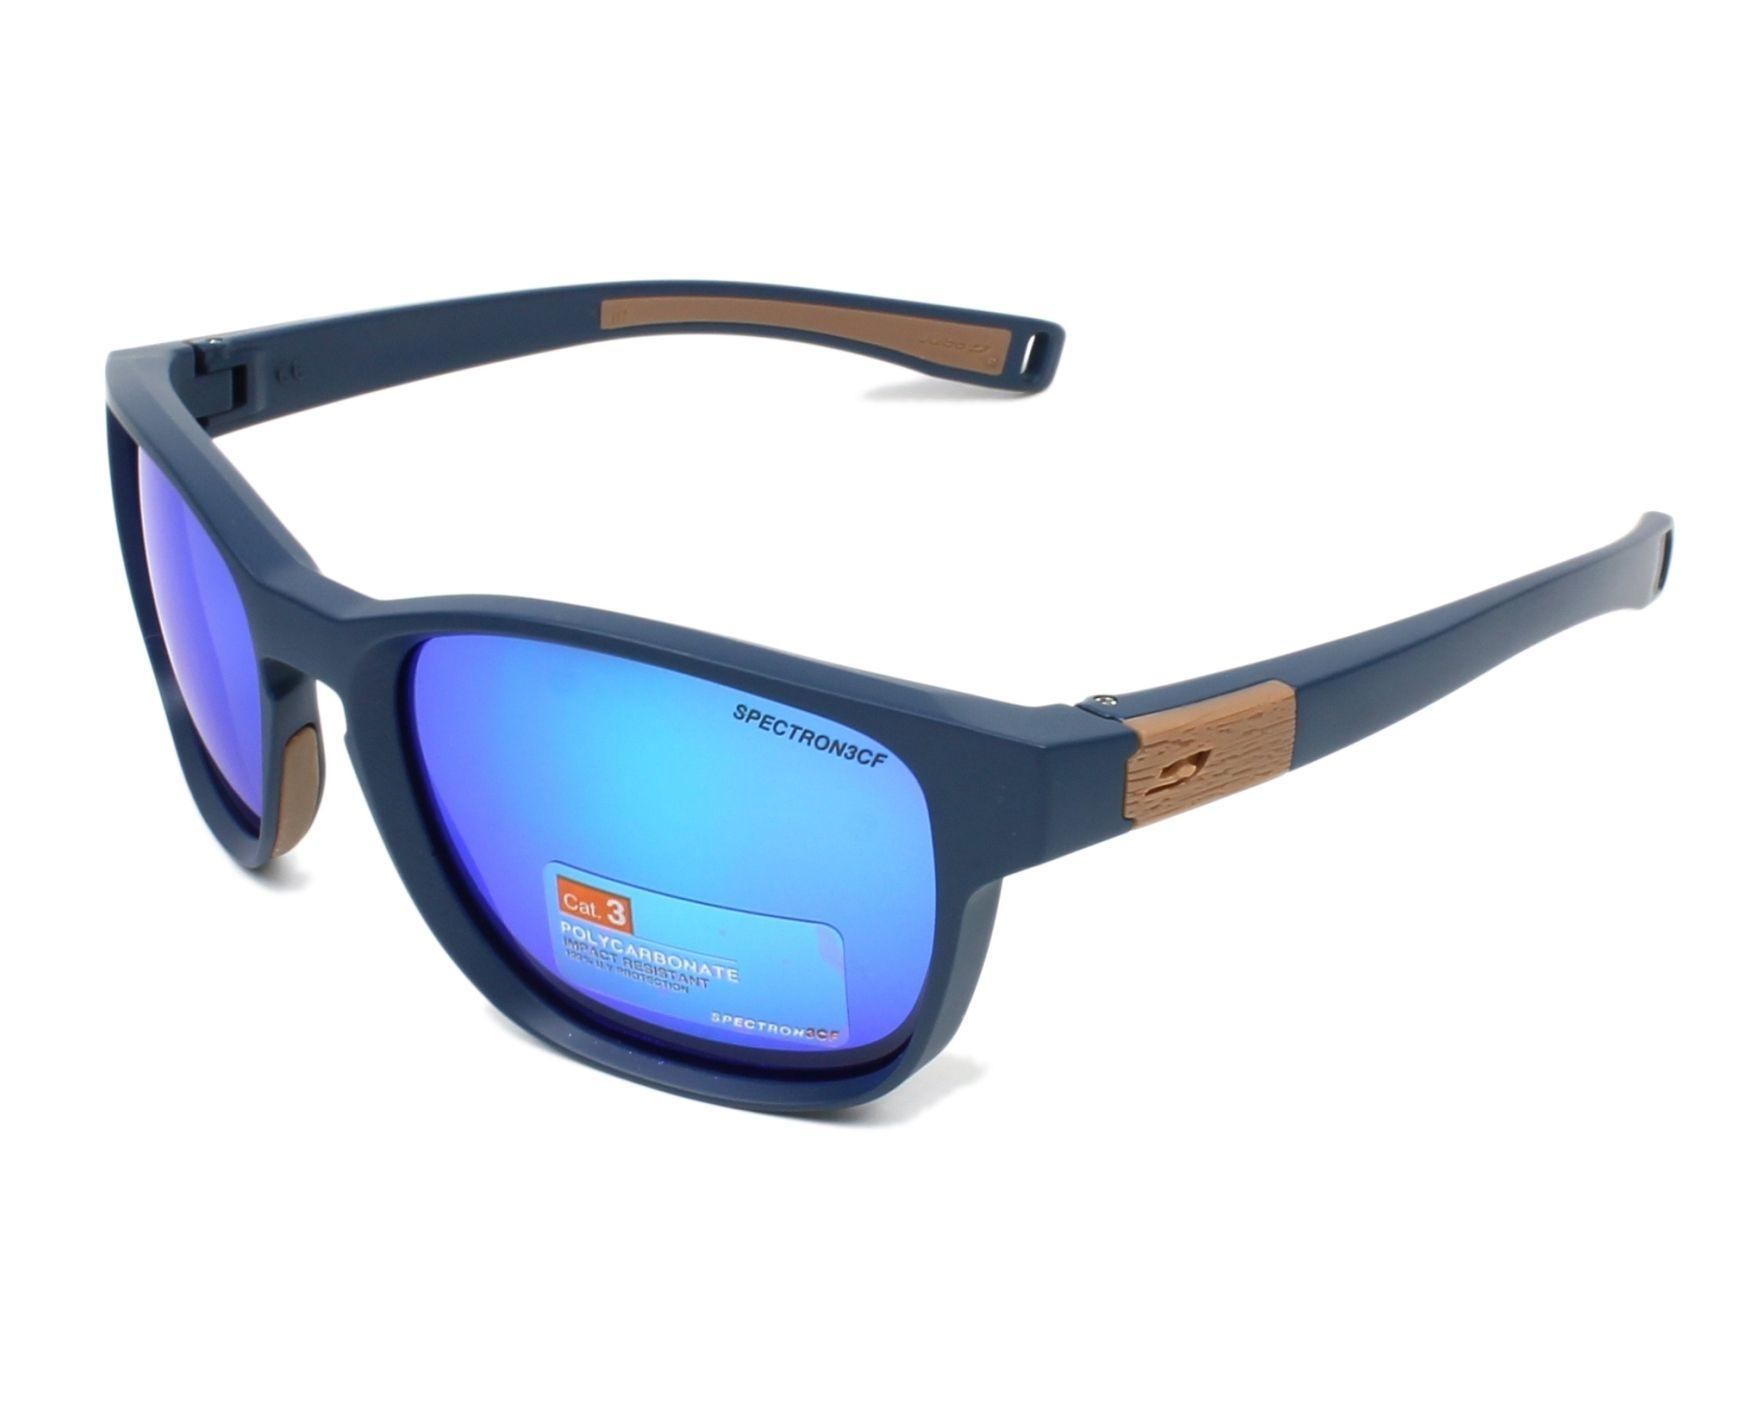 lunettes de soleil julbo j504 1112 bleu avec des verres gris vert. Black Bedroom Furniture Sets. Home Design Ideas